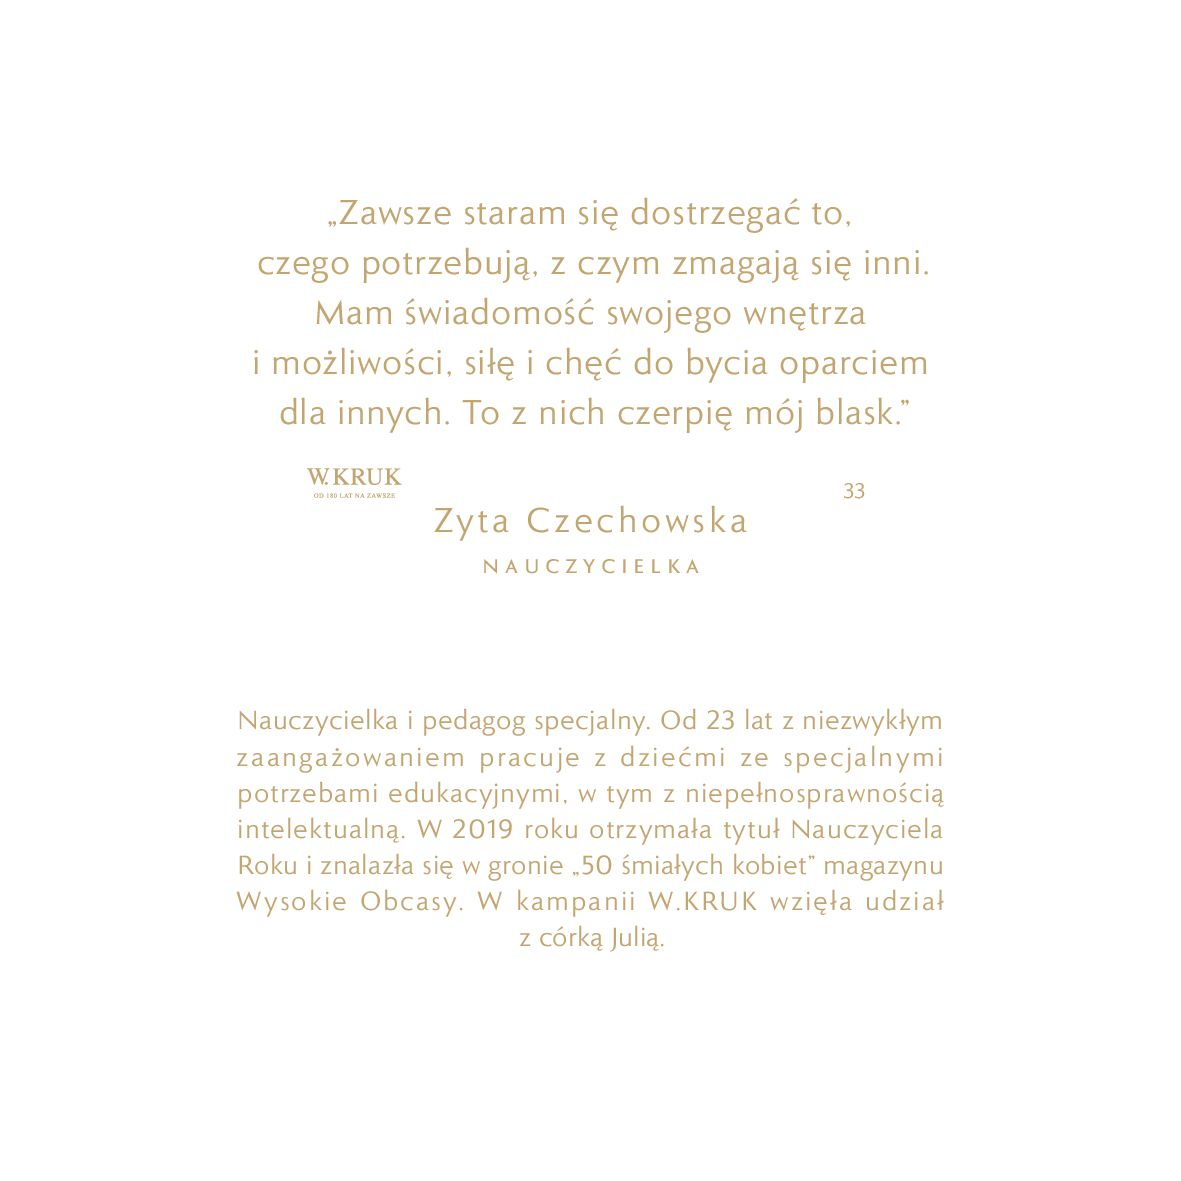 Gazetka W. KRUK: Katalog - Kolekcja Blask 2021-02-17 page-34